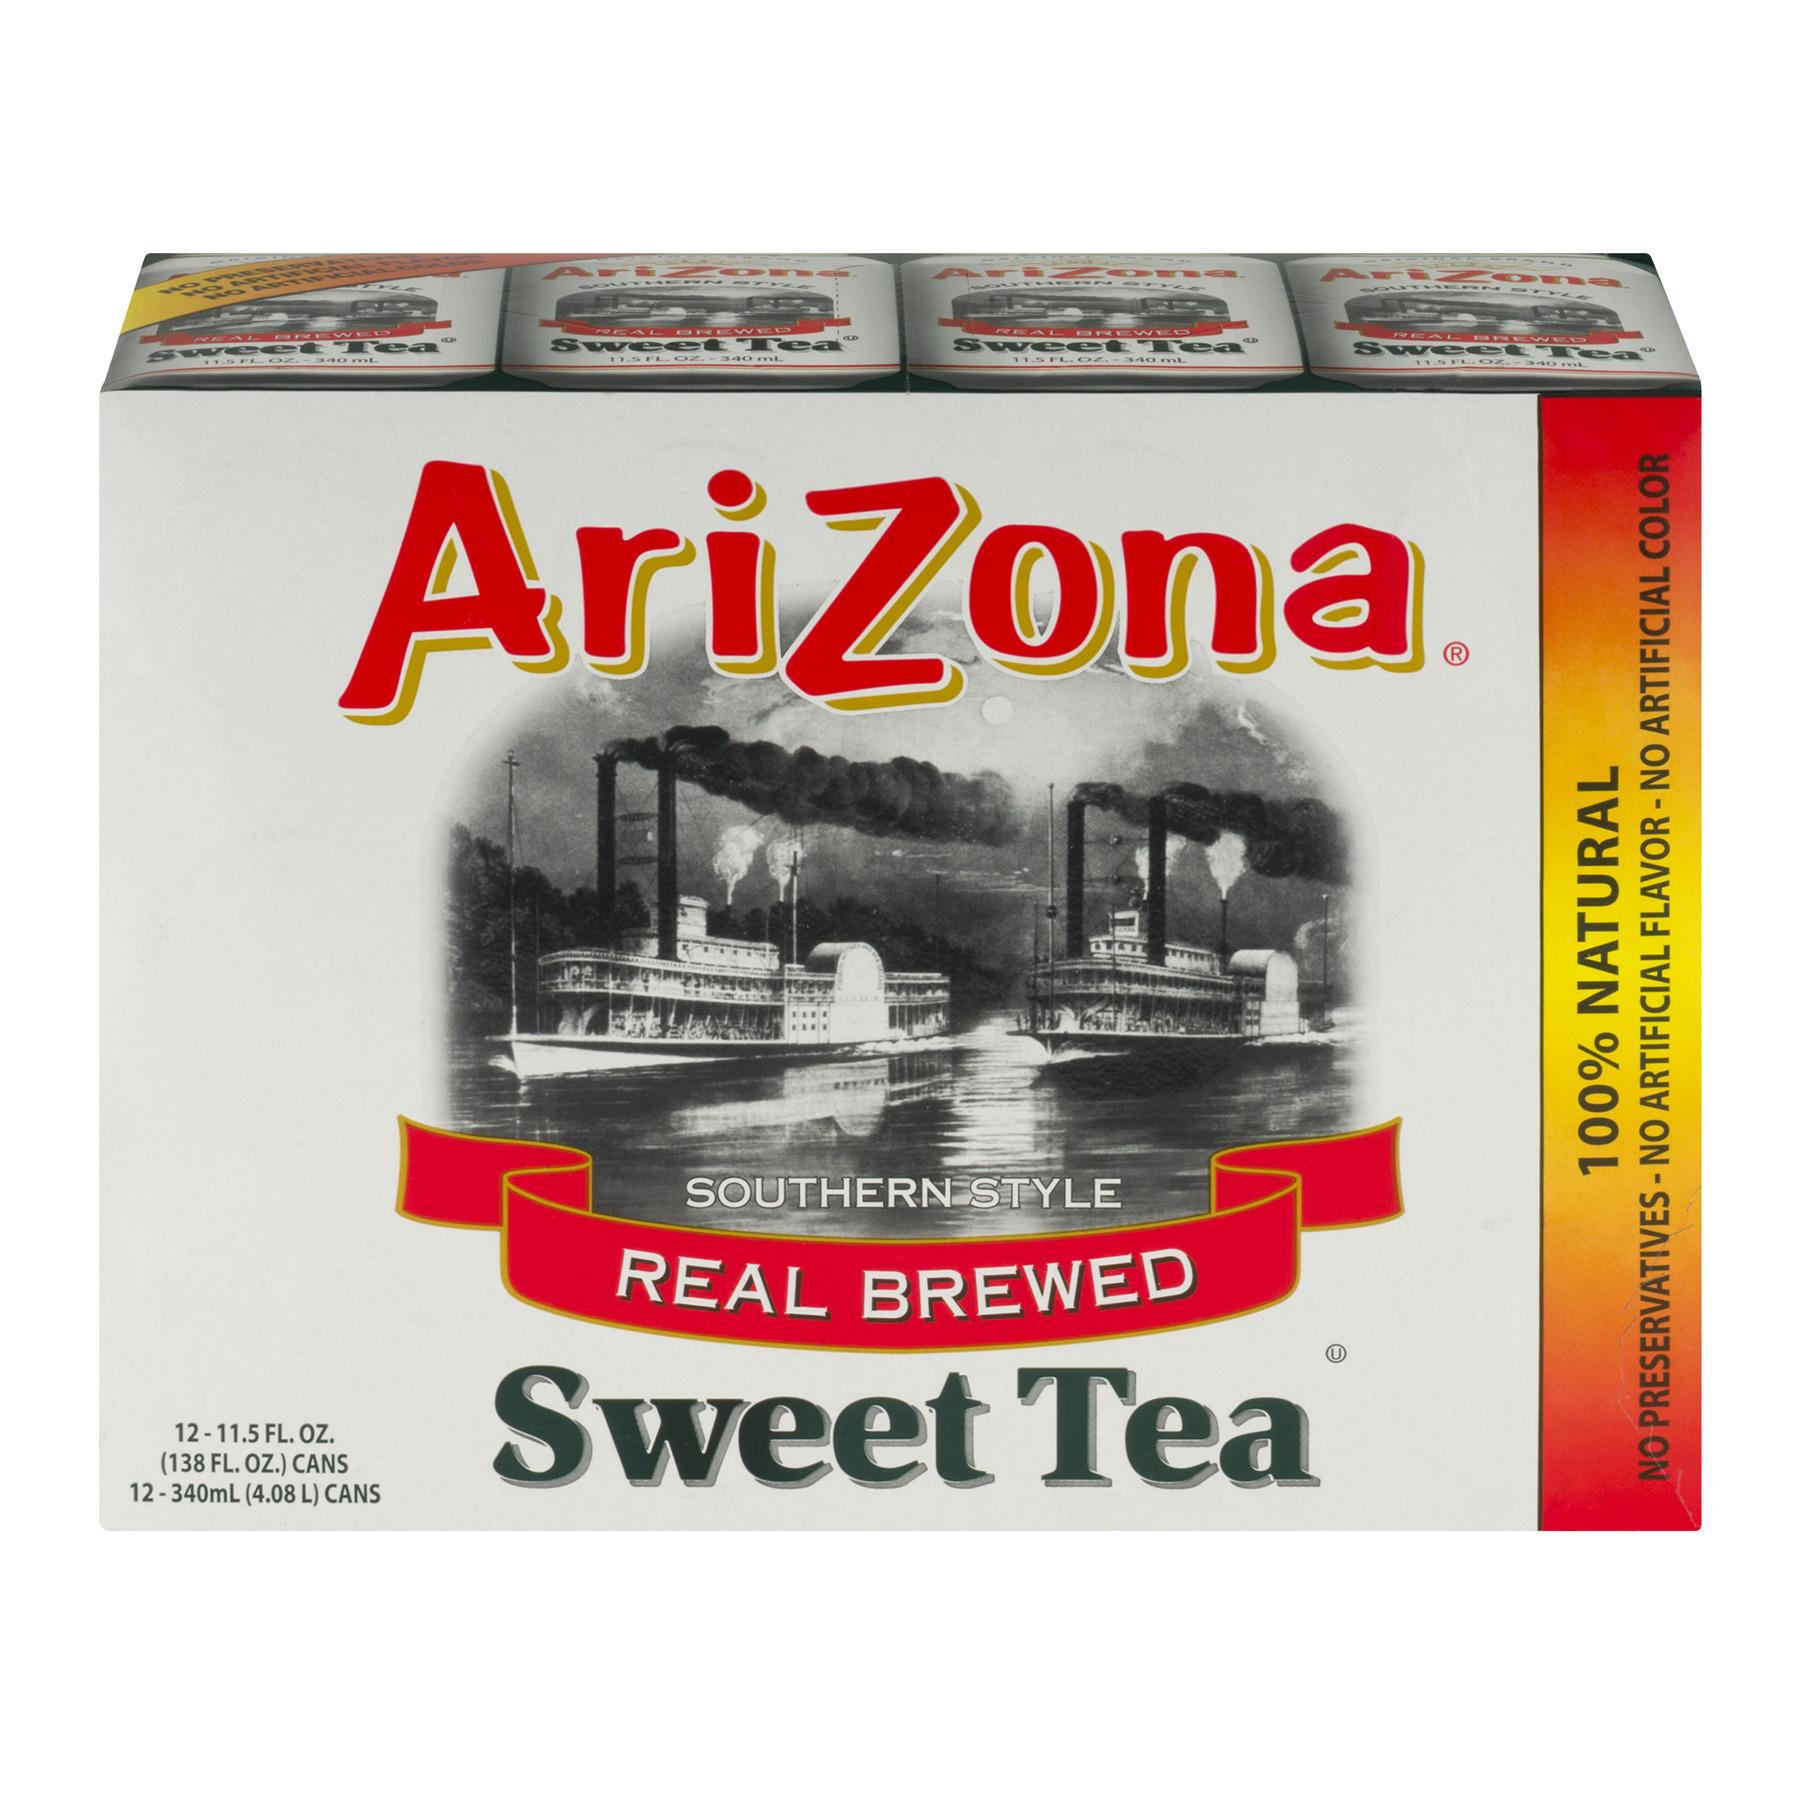 Arizona Southern Style Real Blend Sweet Tea, 11.5 Fl Oz, 12 Count